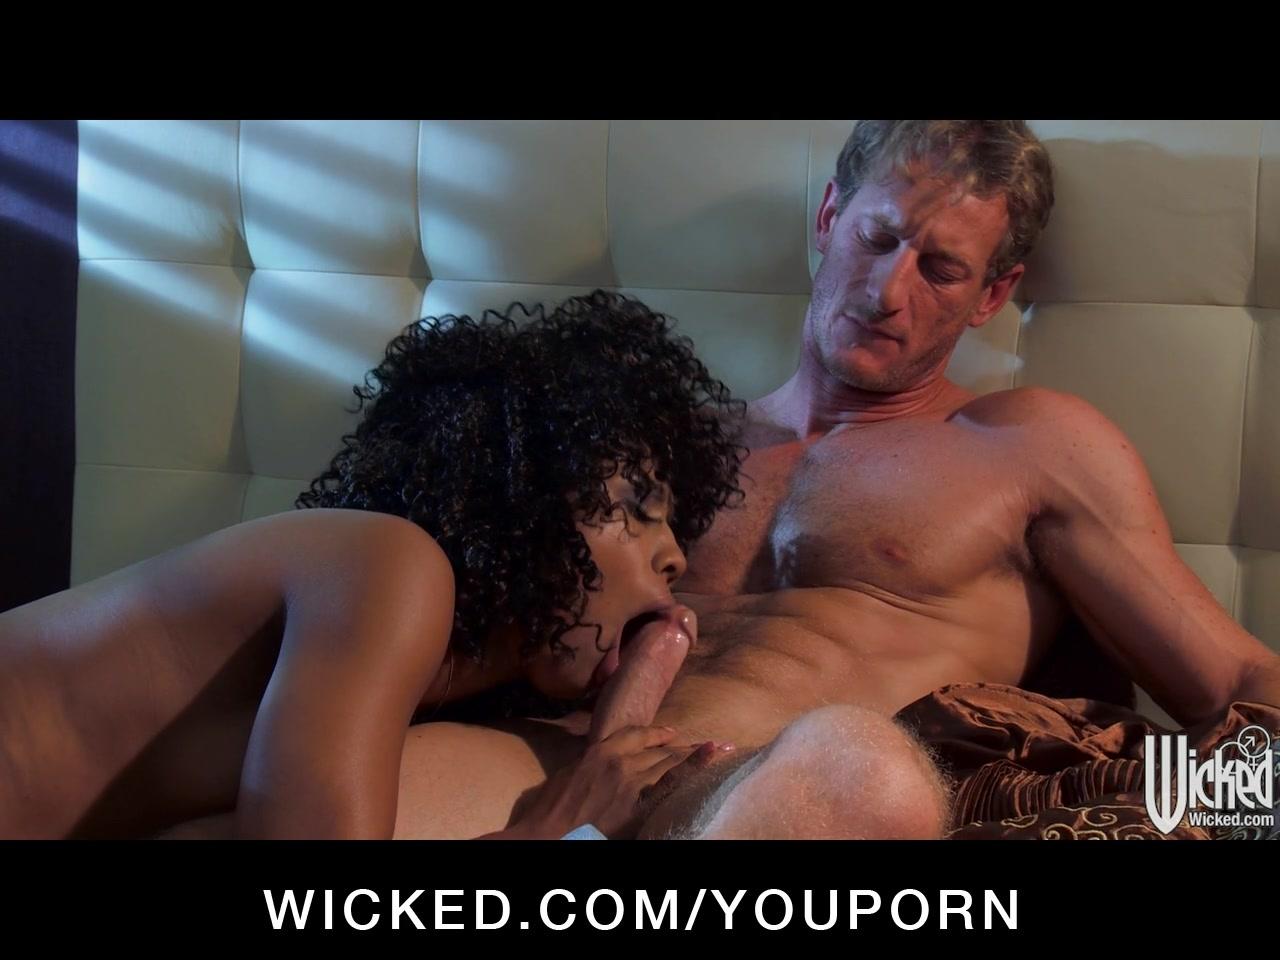 Sexy ebony mistress Misty Stone loves it fast & rough